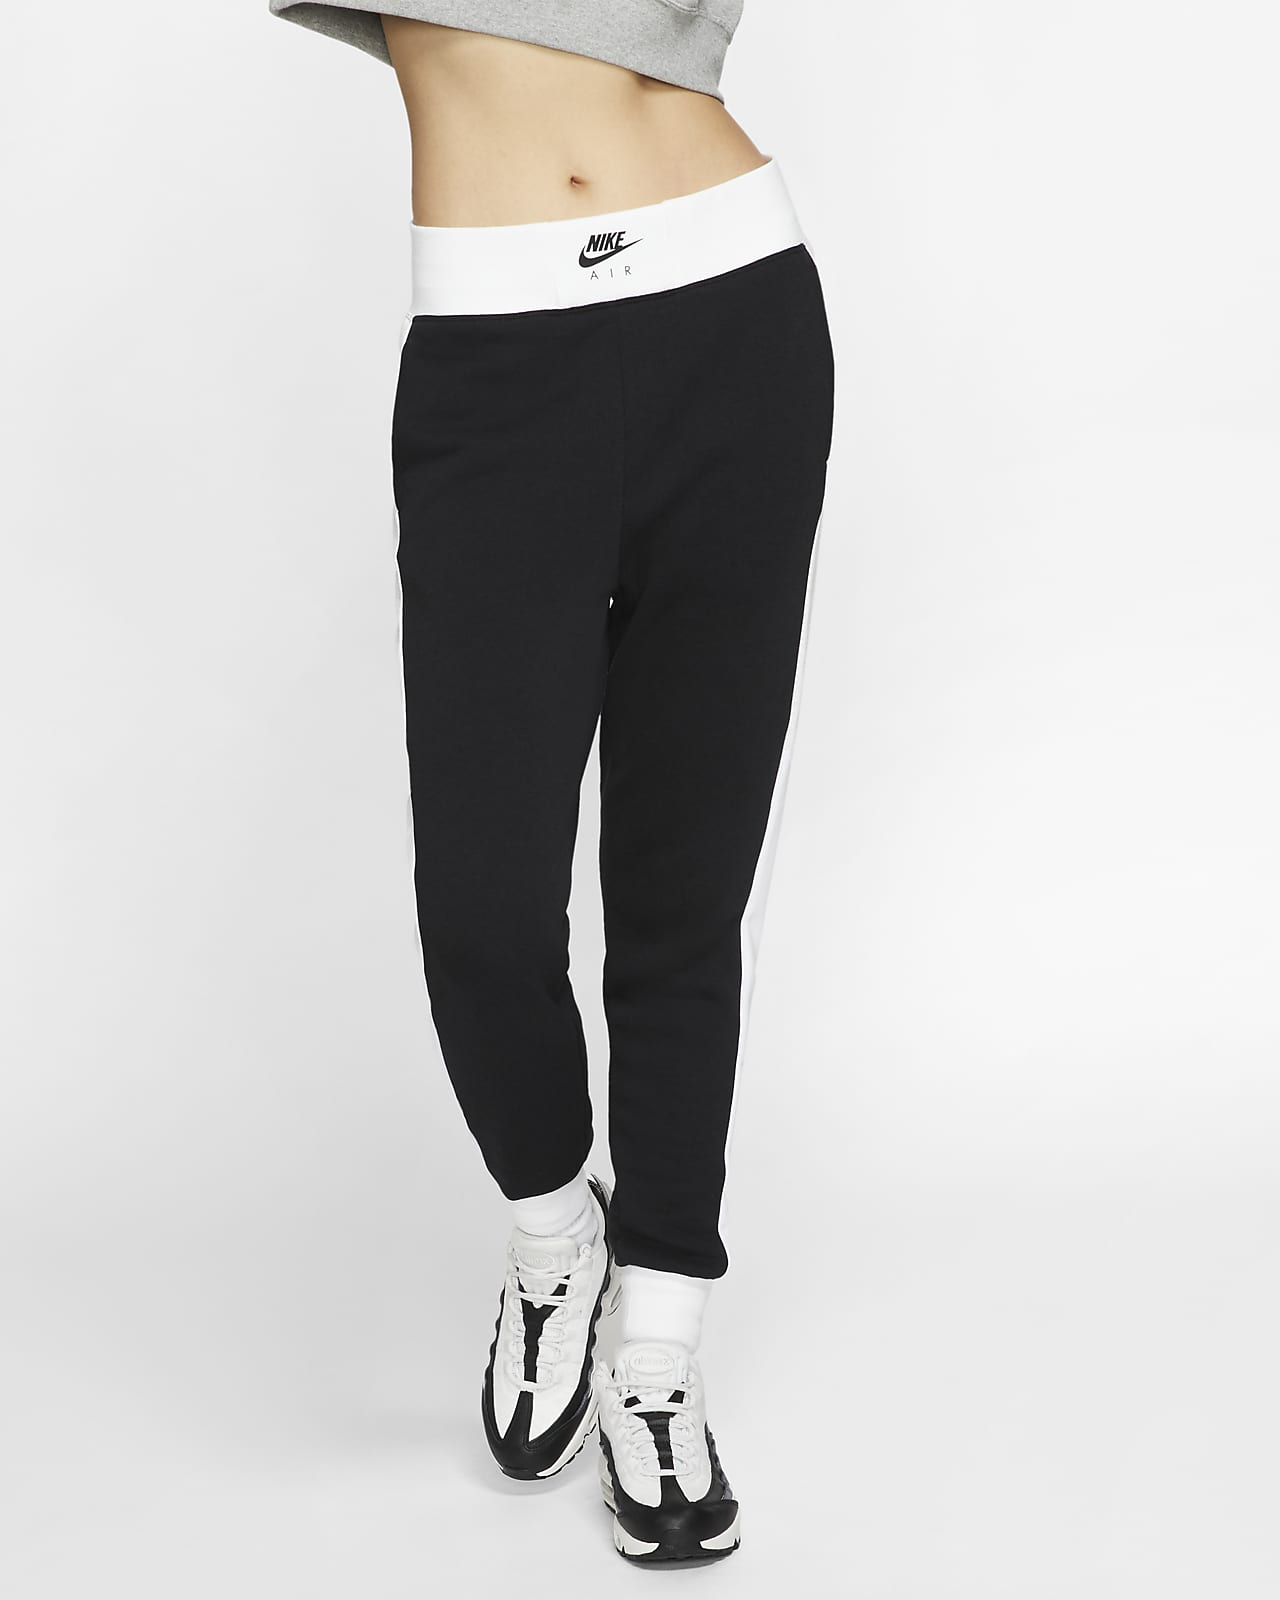 Pantalon Nike Air pour Femme